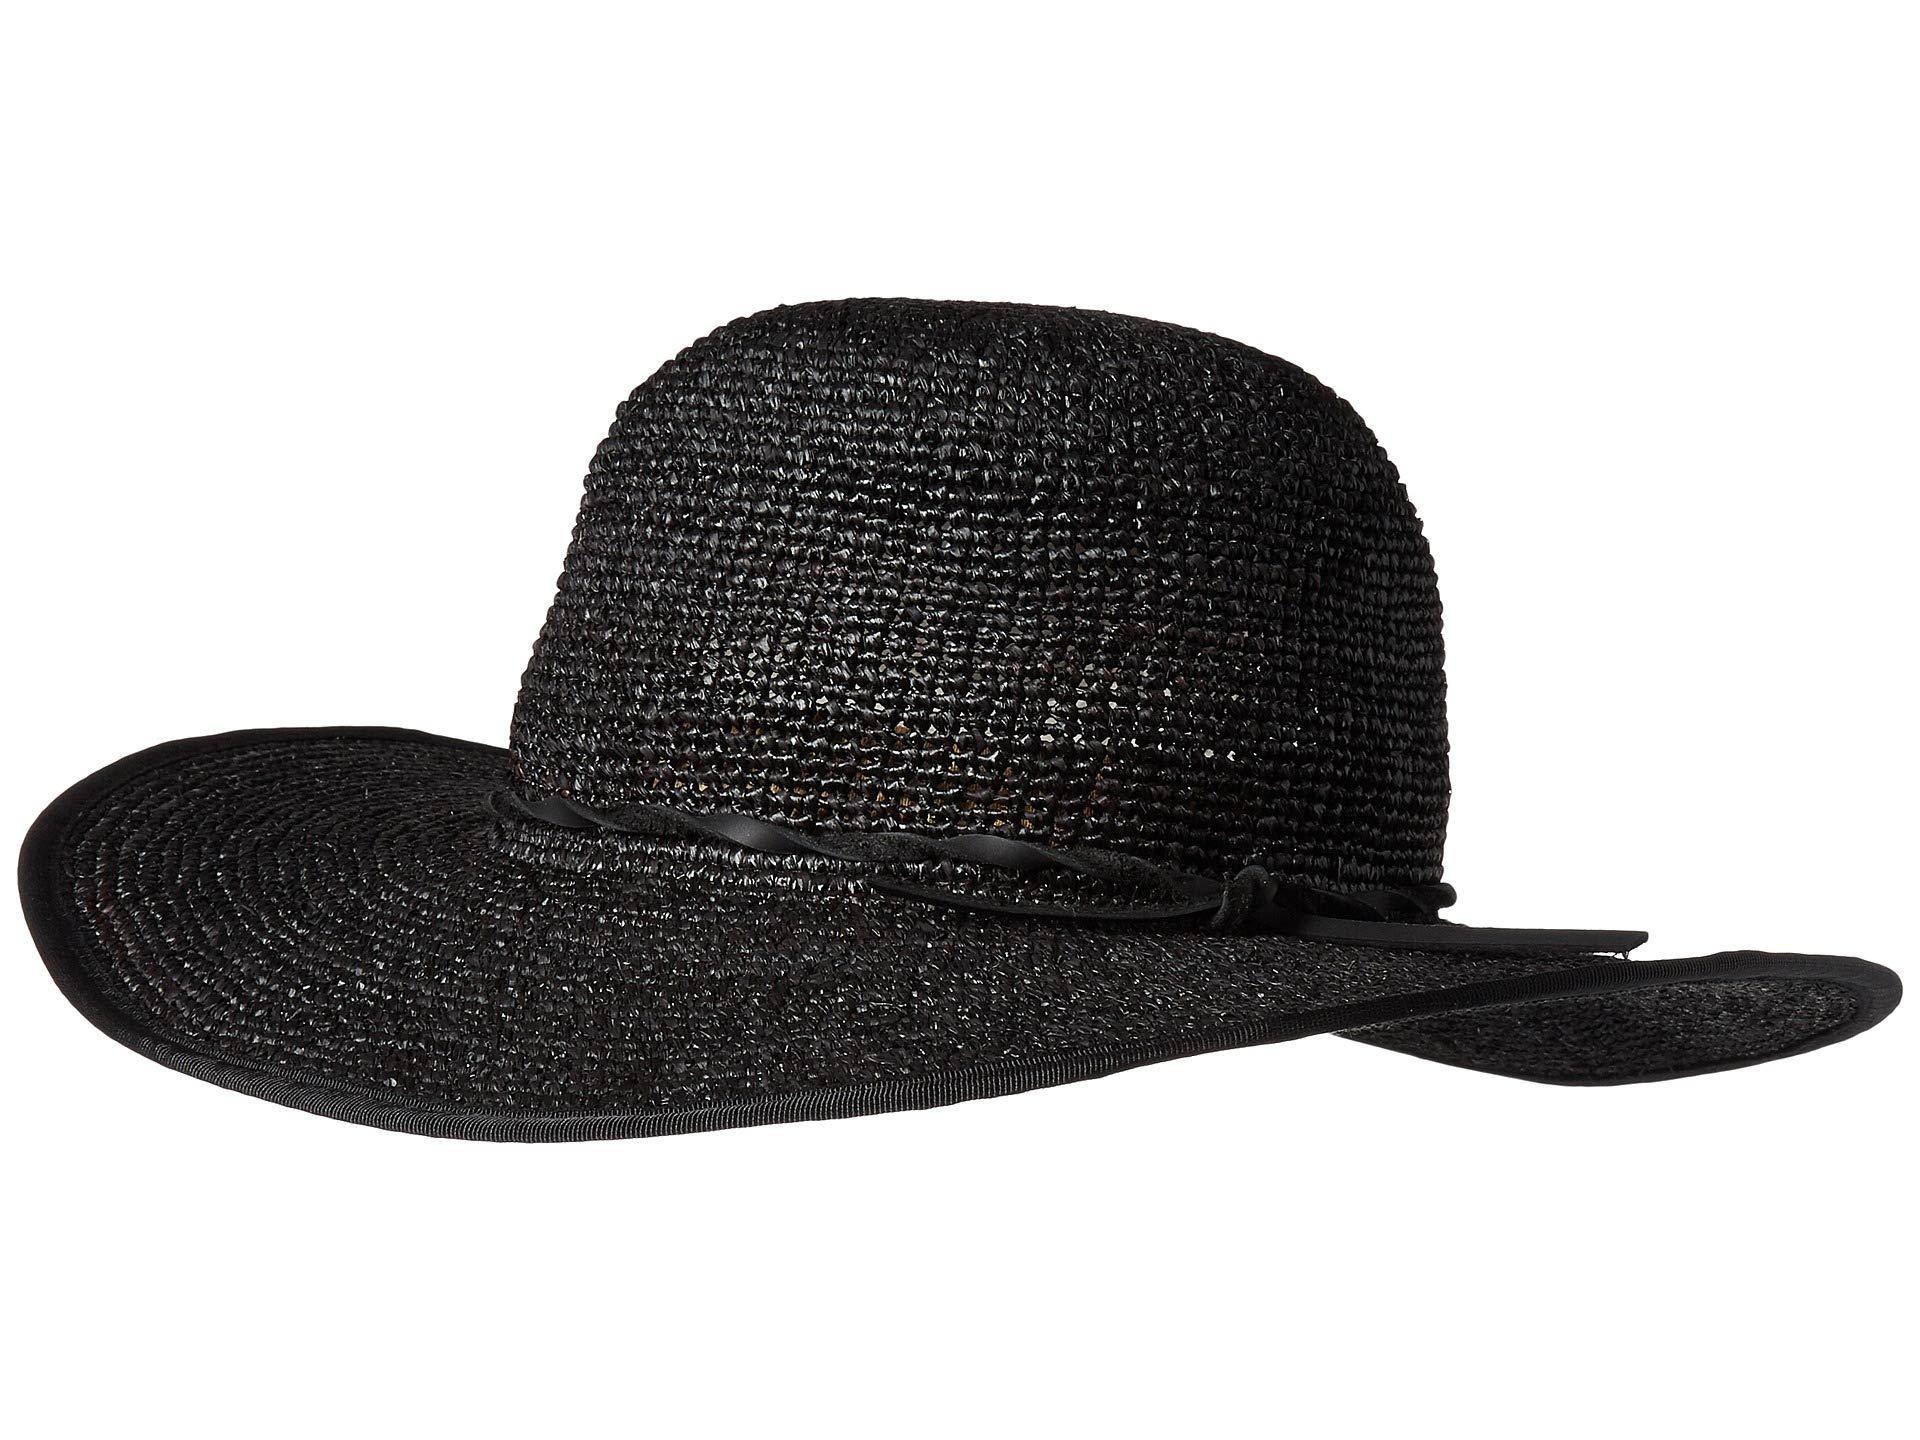 60f68d8ccf1e6 Lyst - Goorin Bros Desert Sun (black) Caps in Black